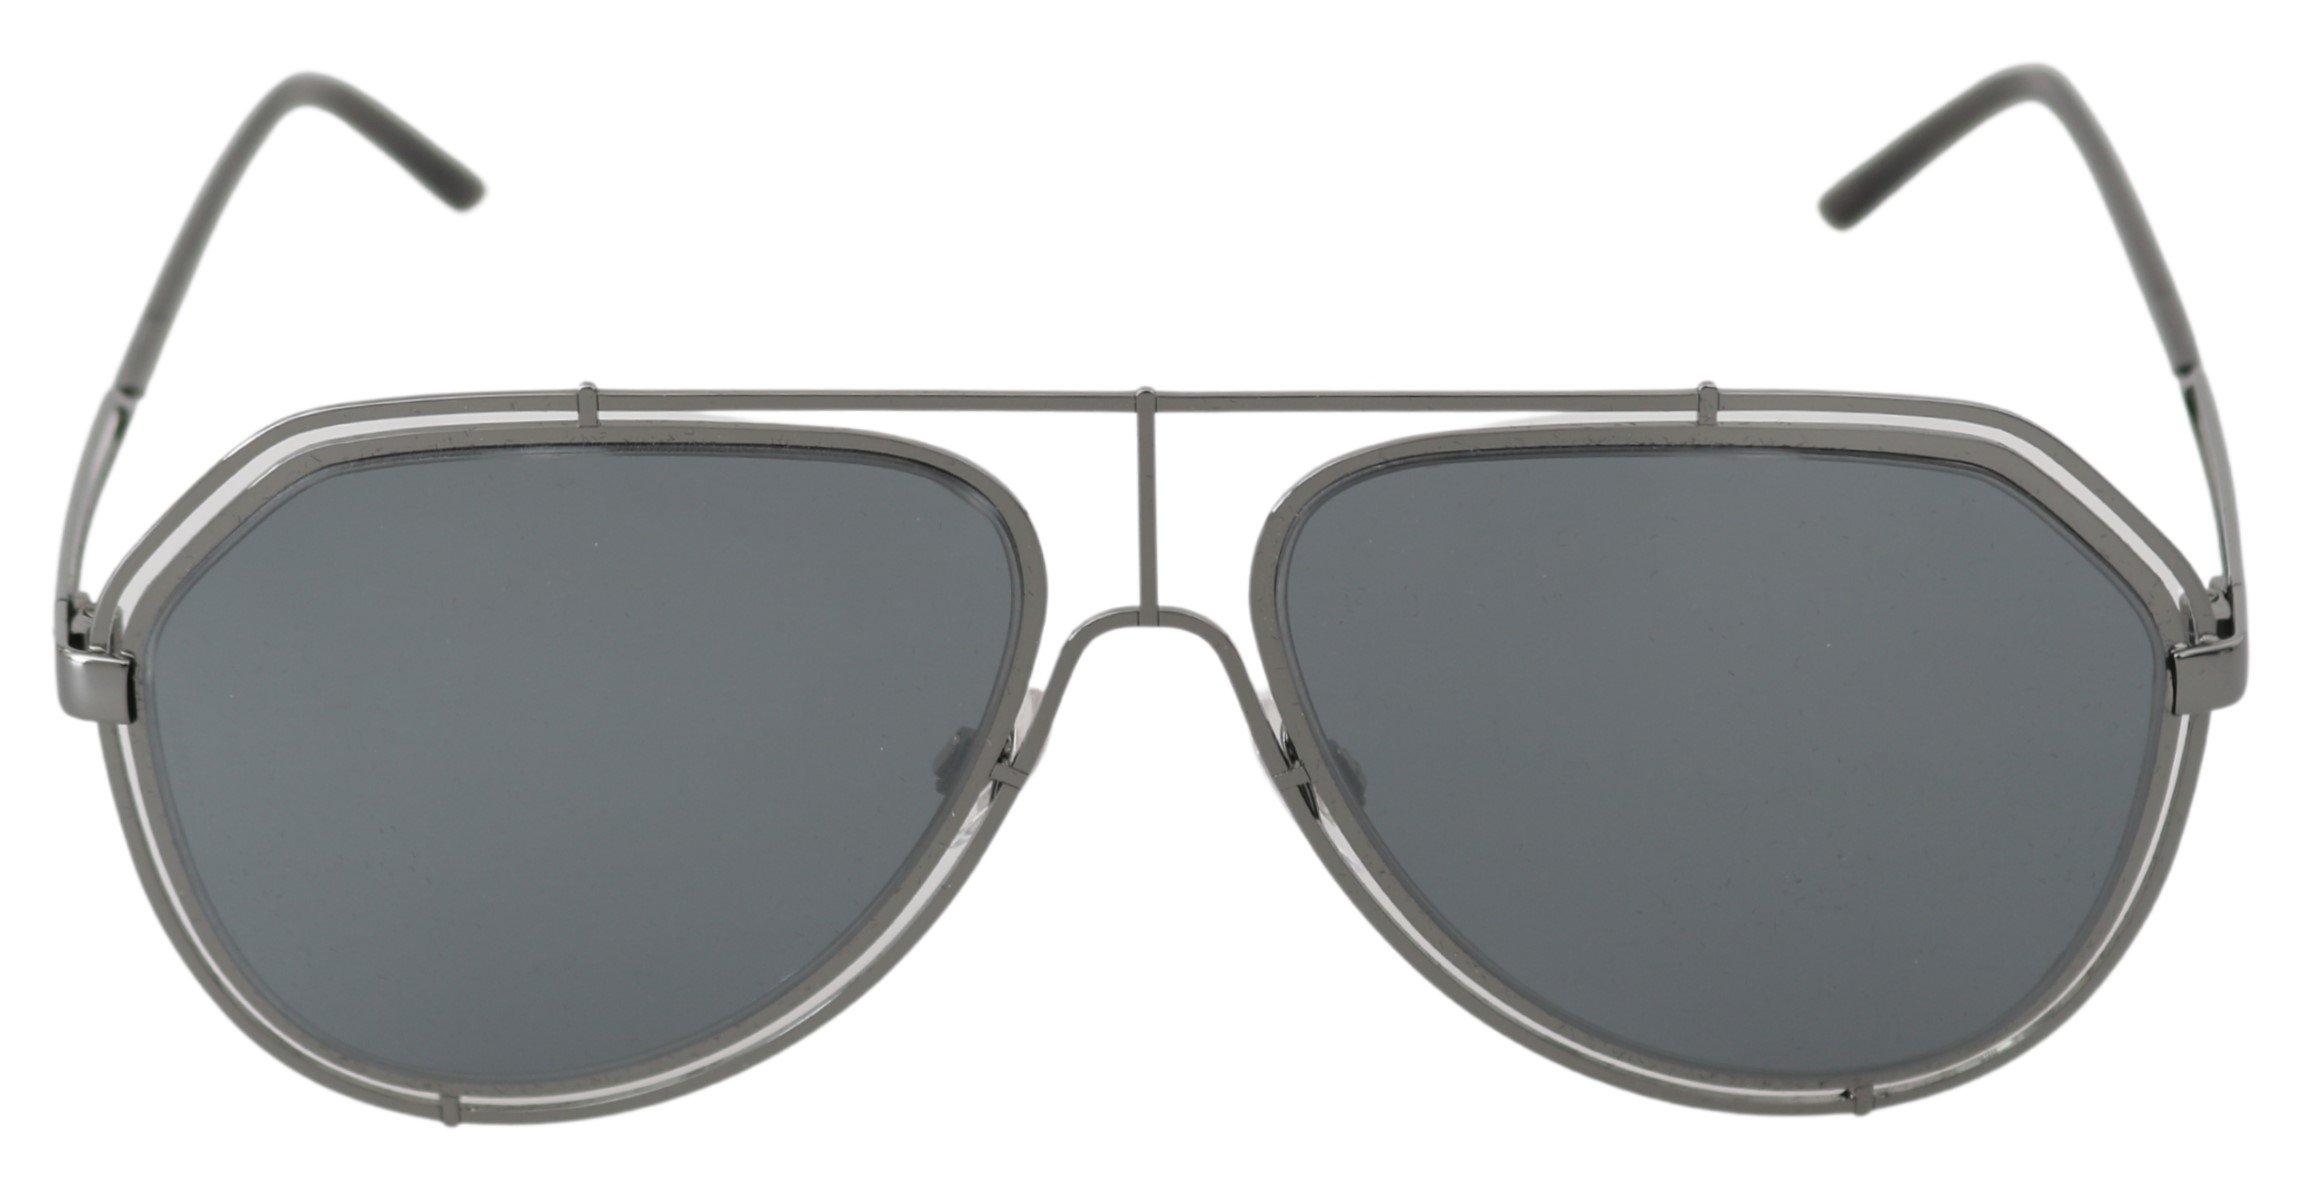 Dolce & Gabbana Women's Logo Pilot Aviator Sunglasses Gray GLA765